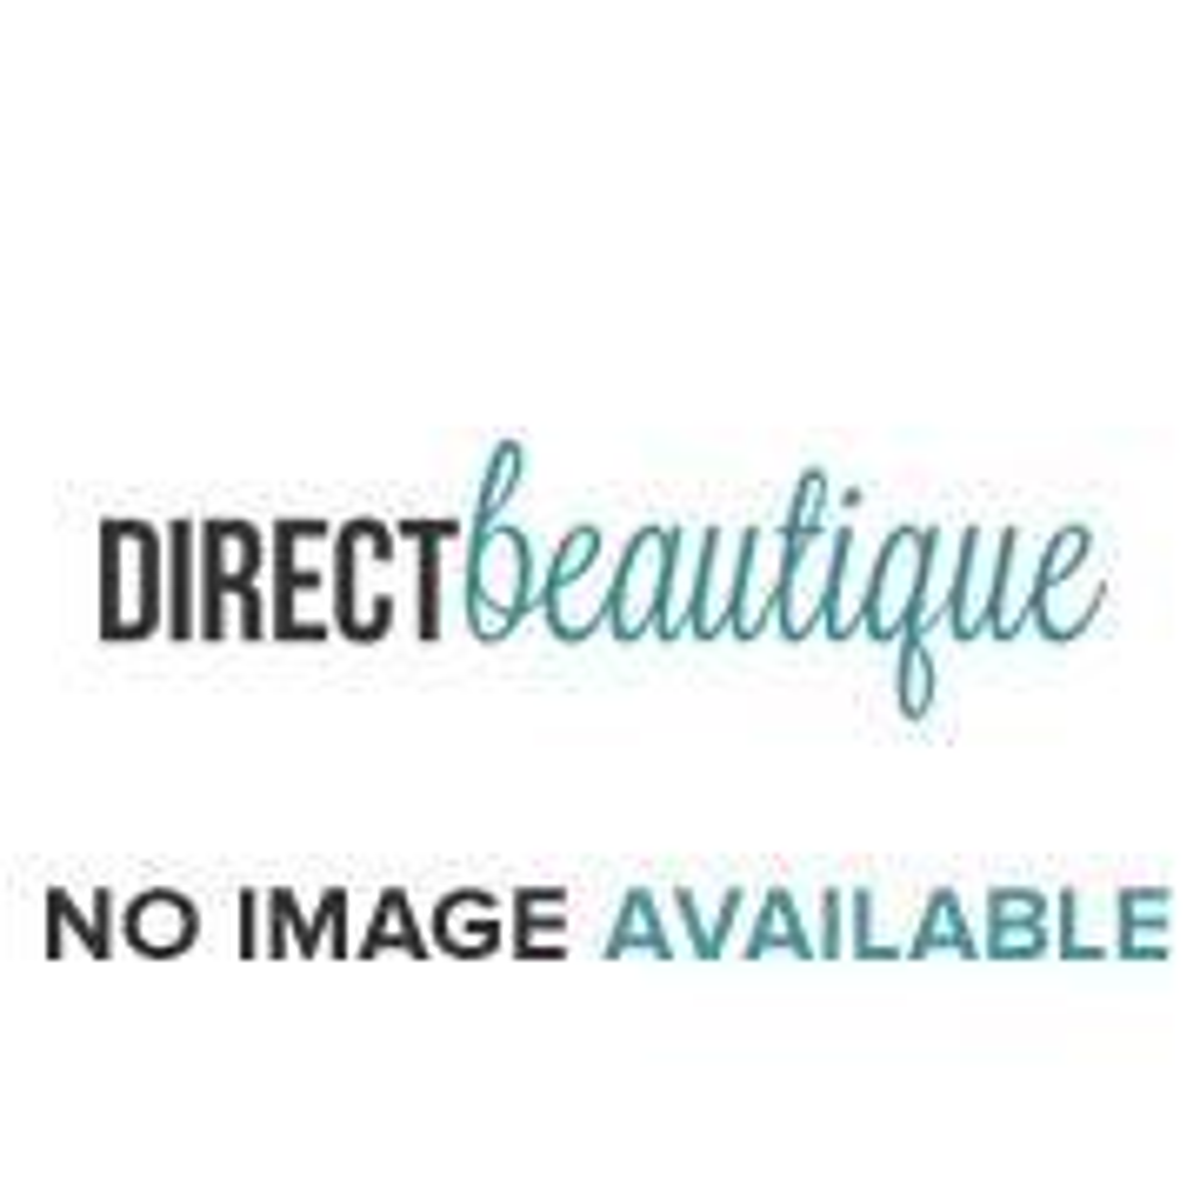 http://www.directbeautique.co.uk/images/dana-dana-mandate-aftershave-50ml-for-men-p969-3497_medium.jpg